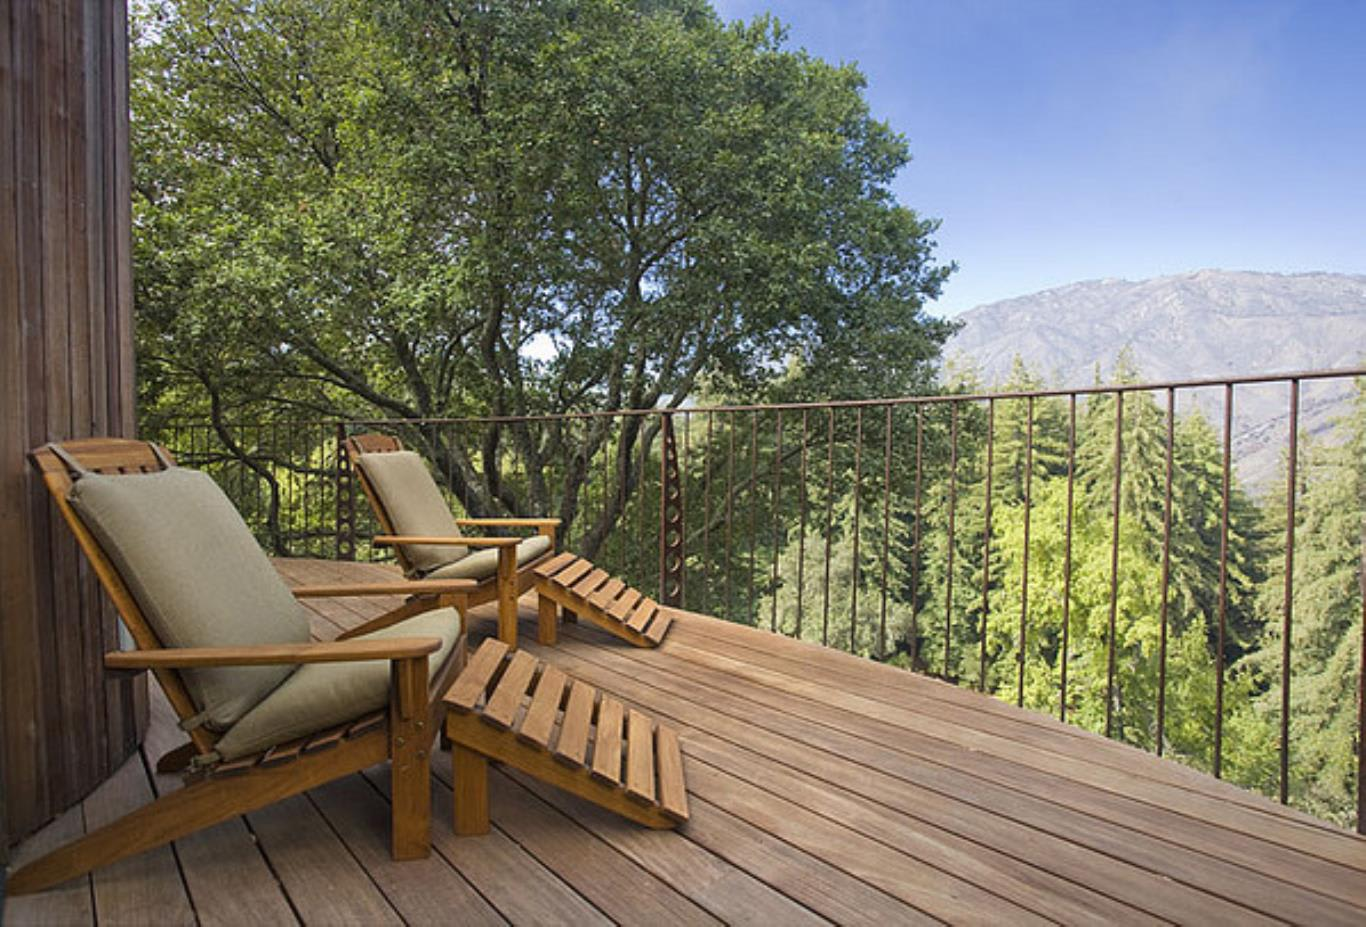 Mountain house balcony